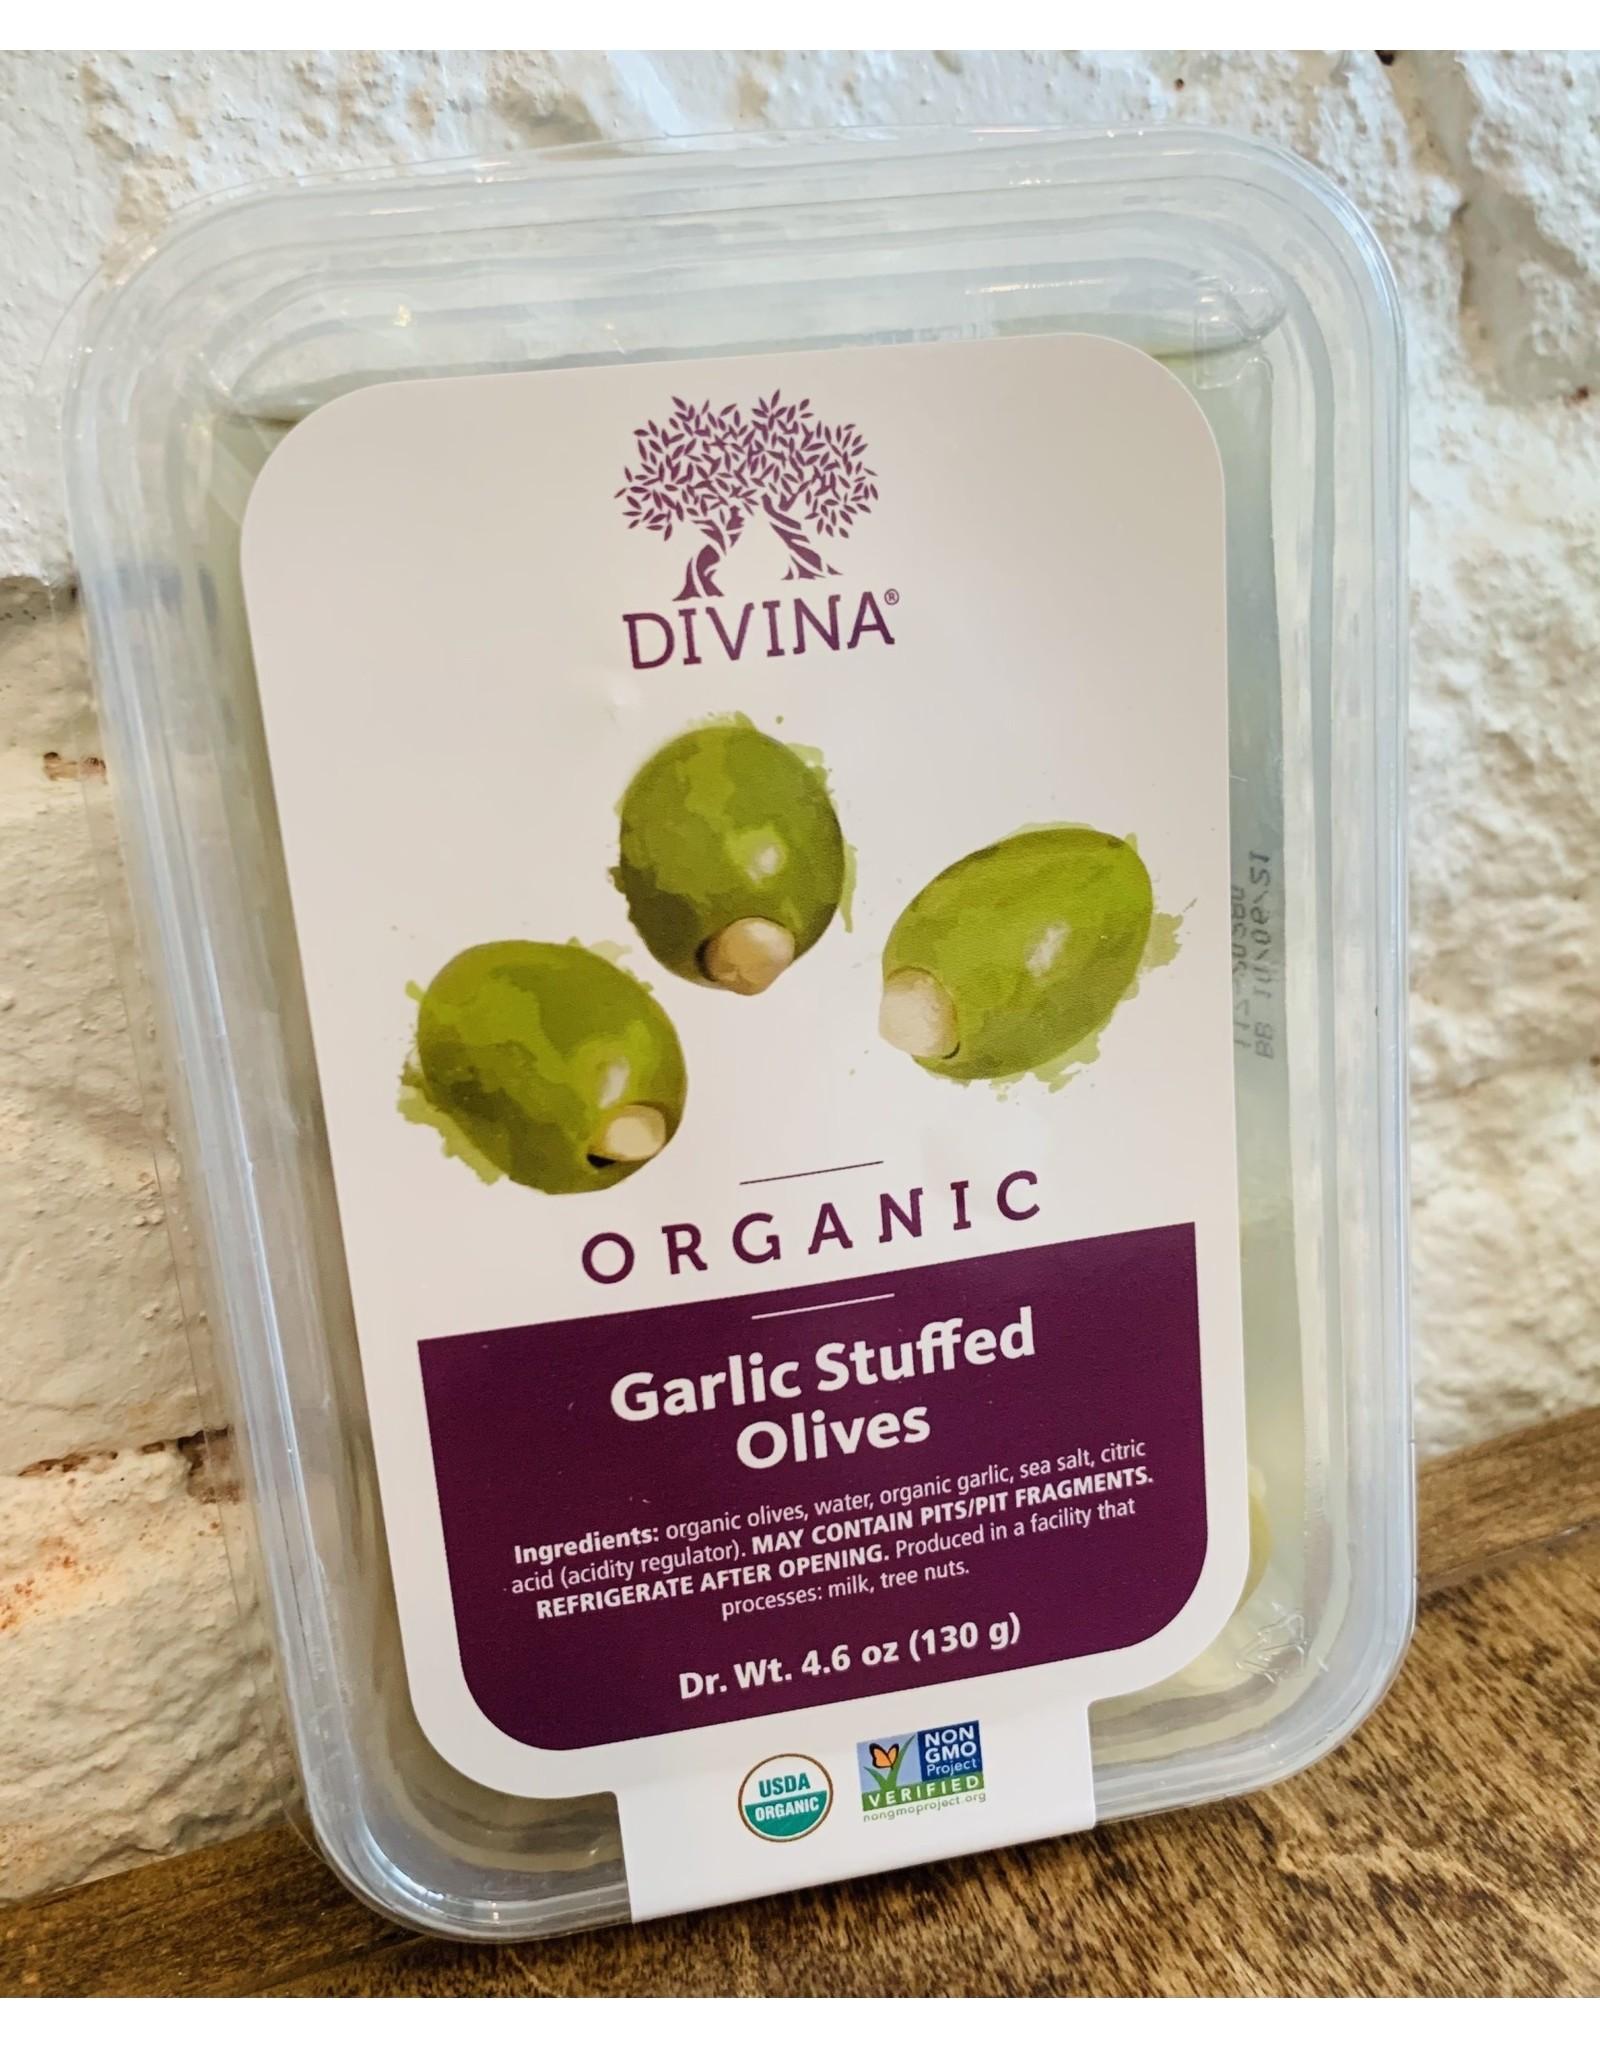 Divina Divina Garlic Stuffed Organic Olives